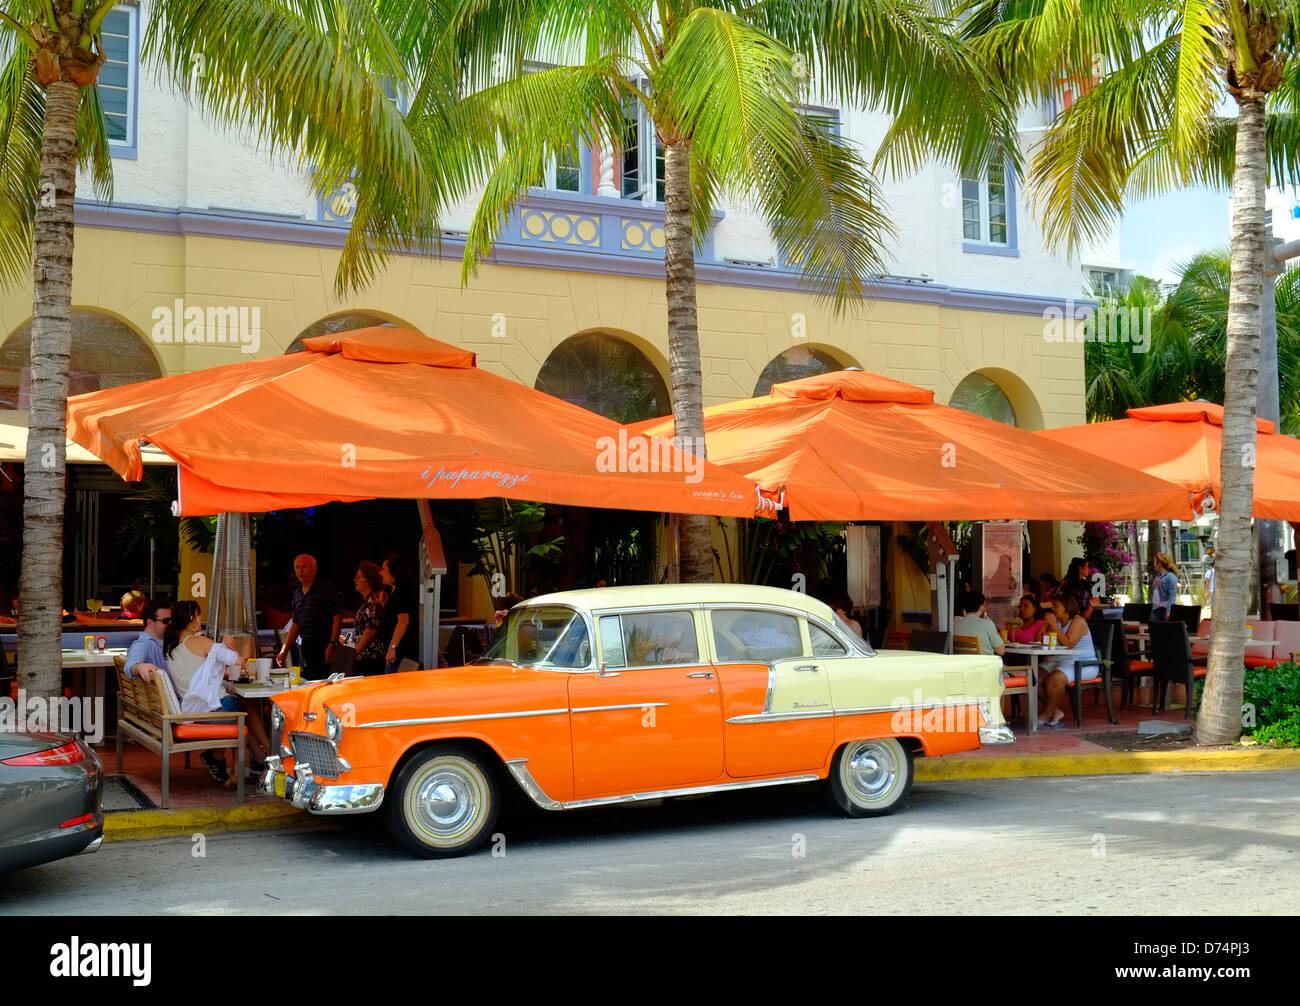 Art Deco district, ocean drive, Miami, Florida - Stock Image